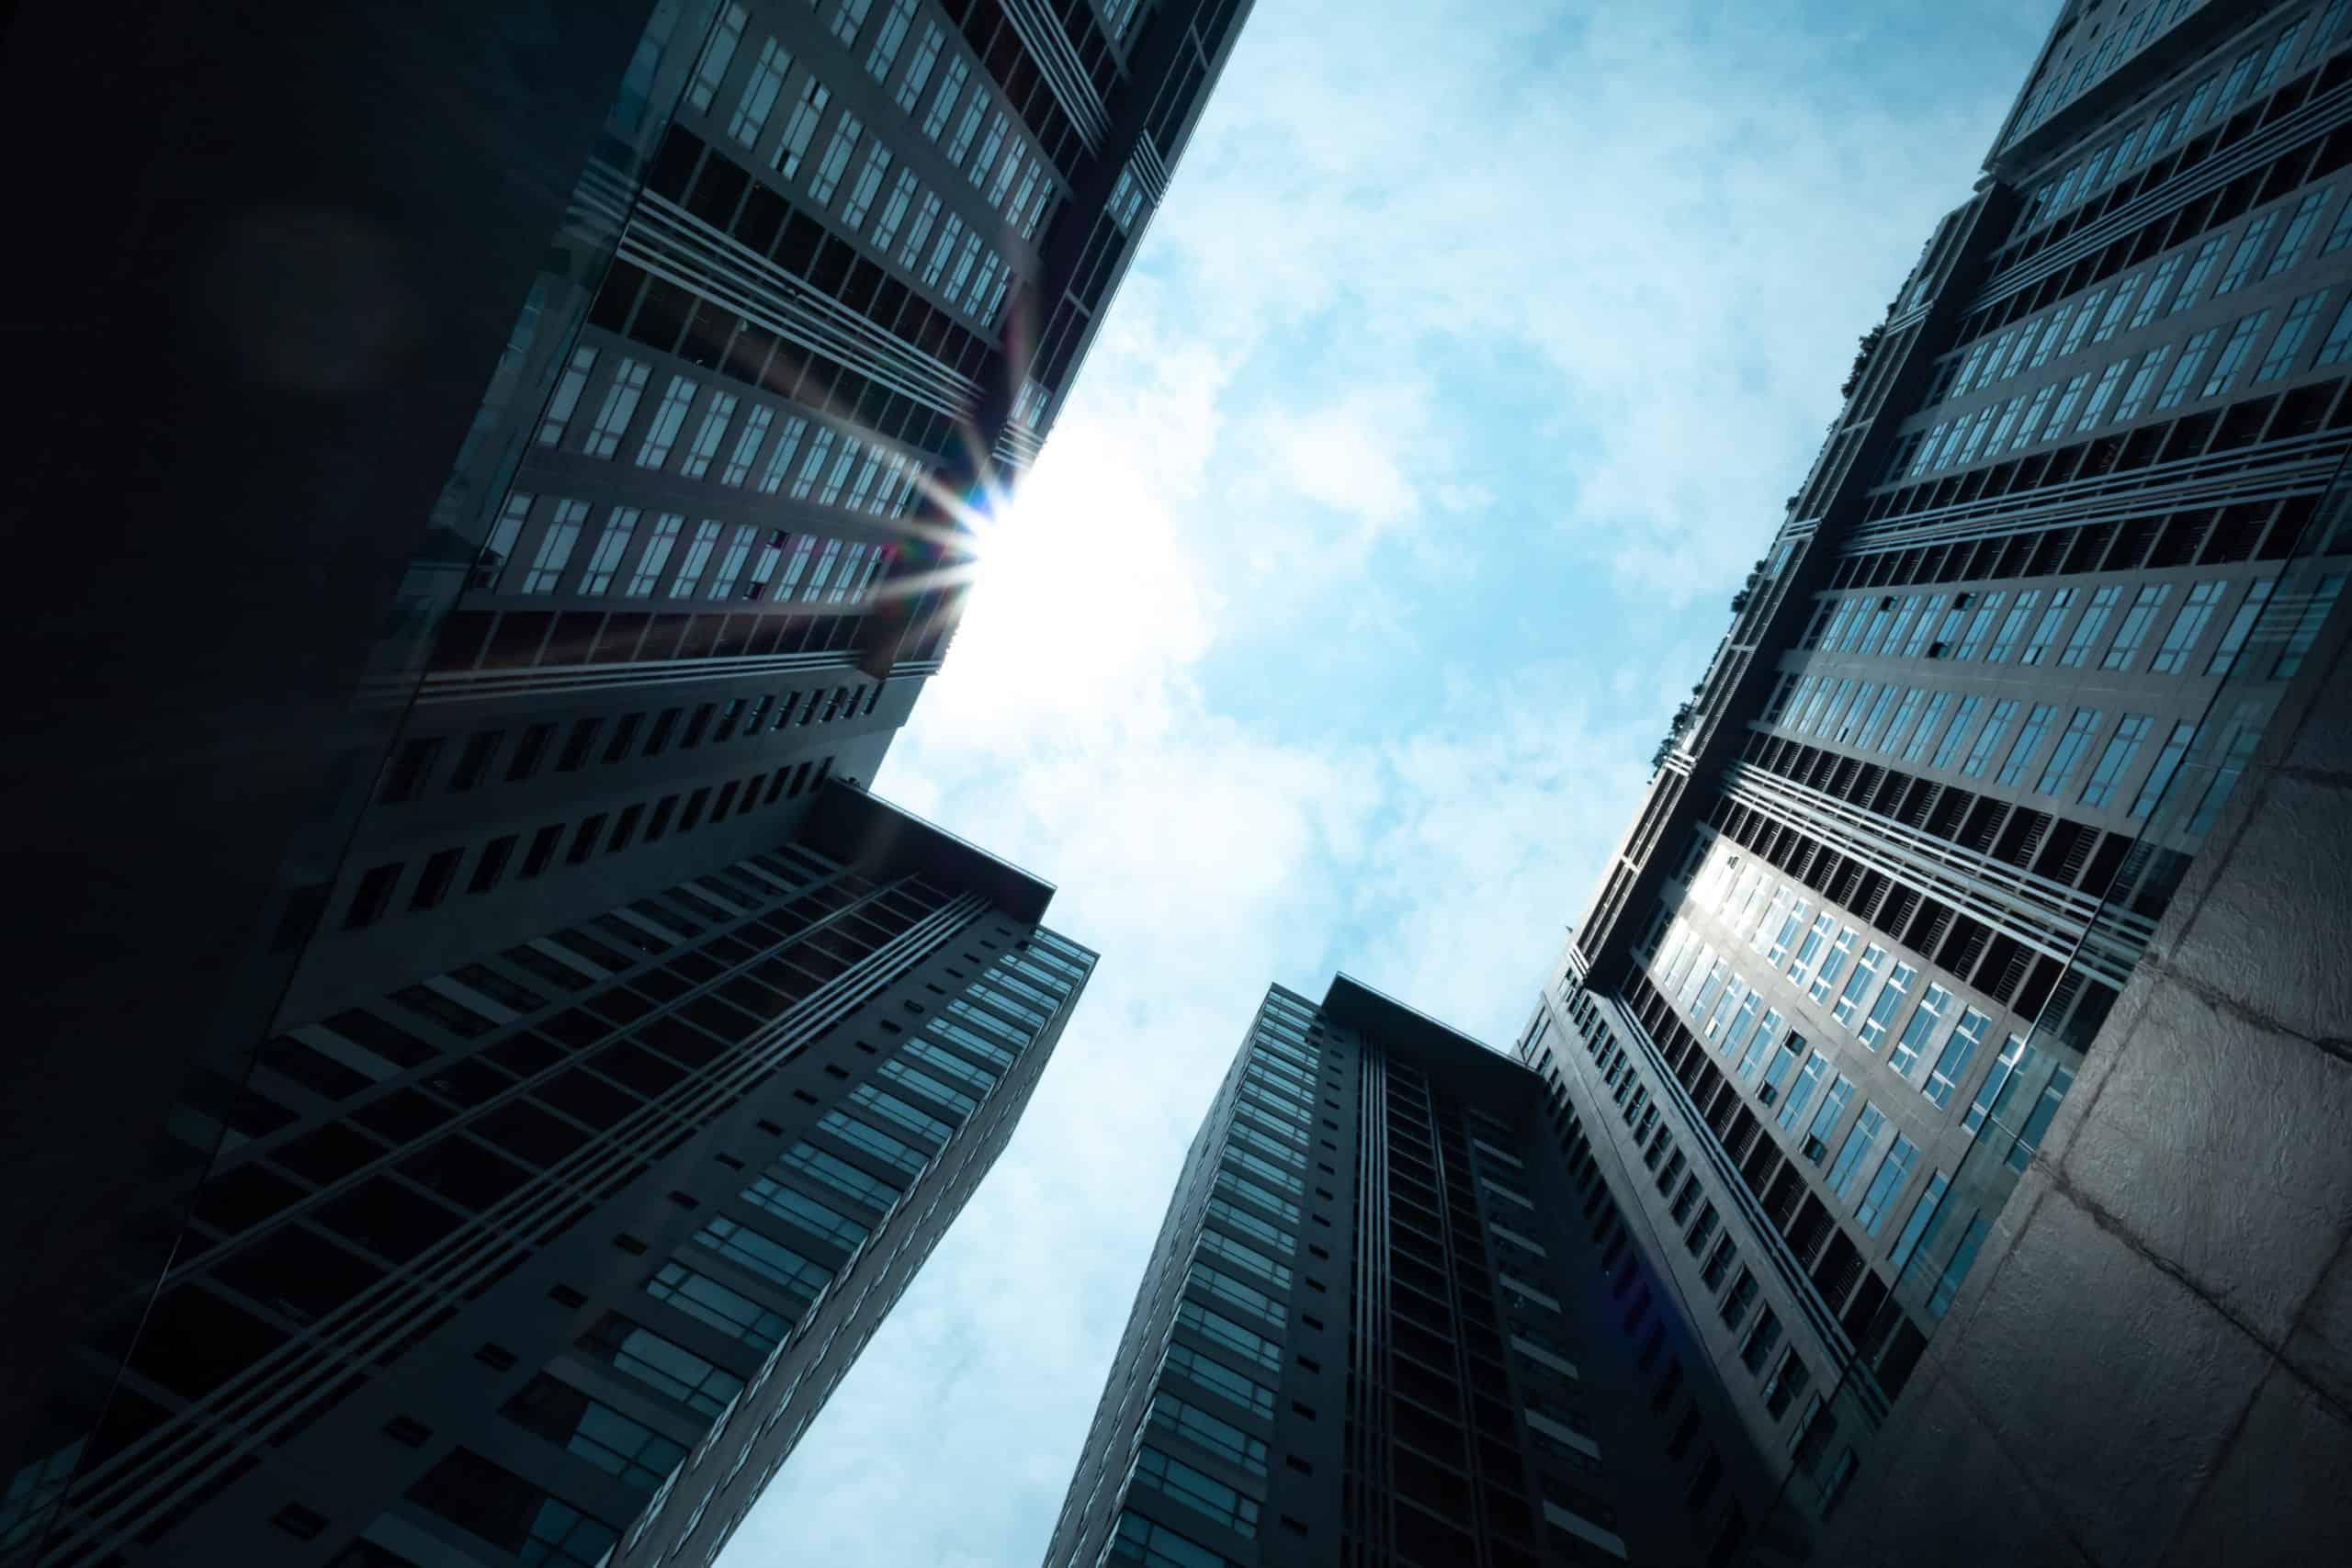 hong kong modern skyscraper building scaled